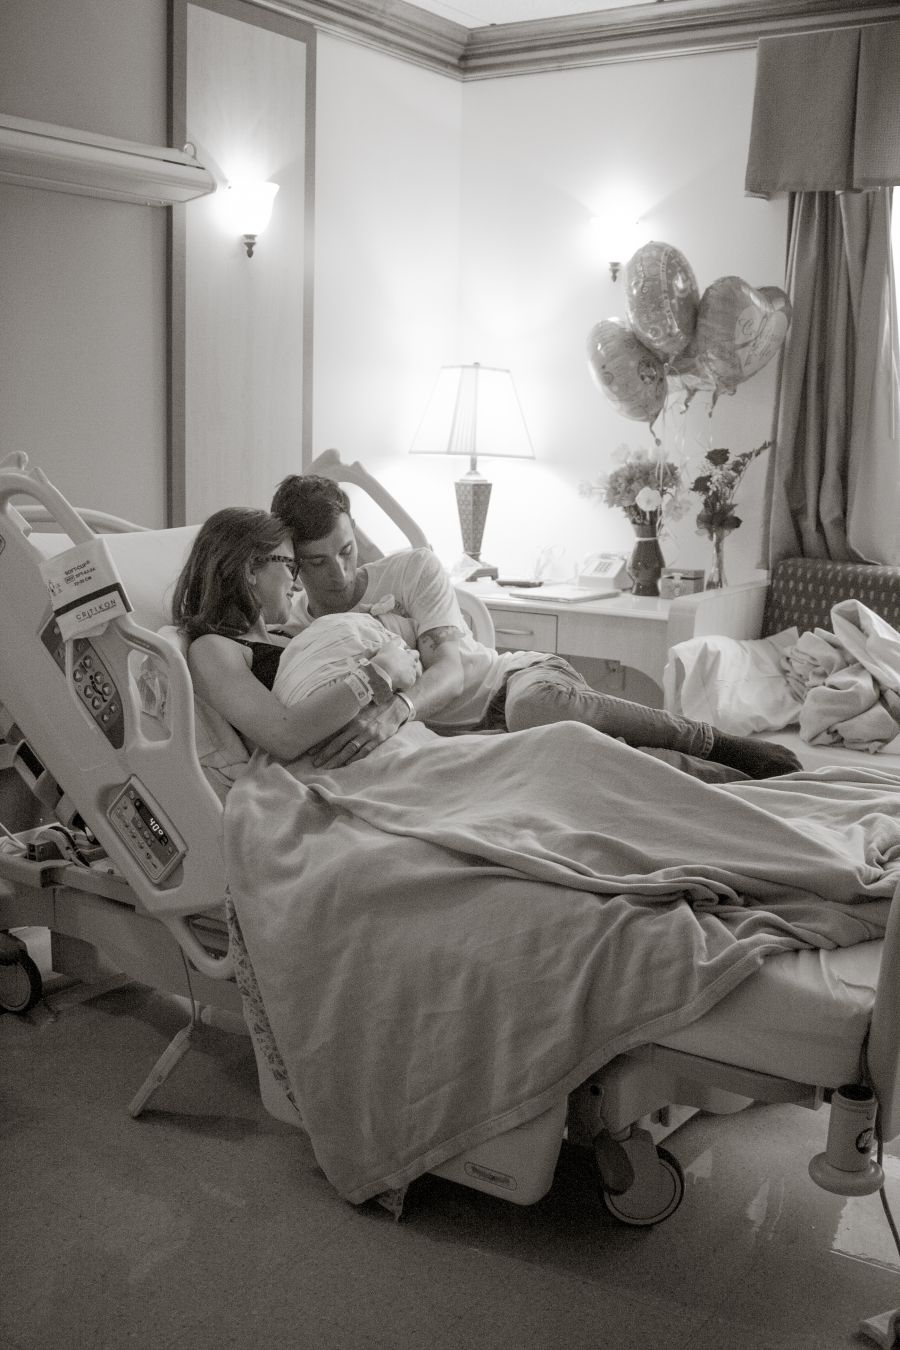 Tomball, TX Fresh 48 hospital photographer